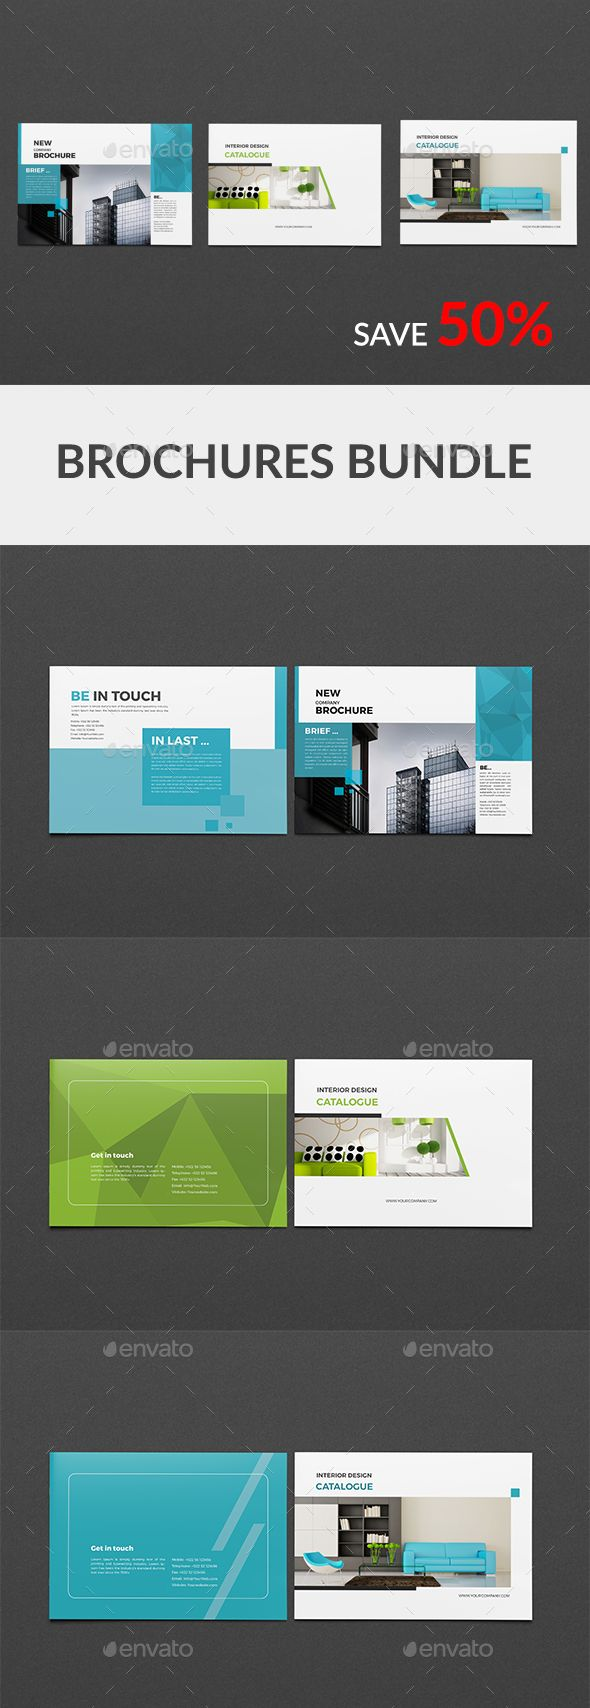 a5 brochure bundle corporate brochures design pinterest